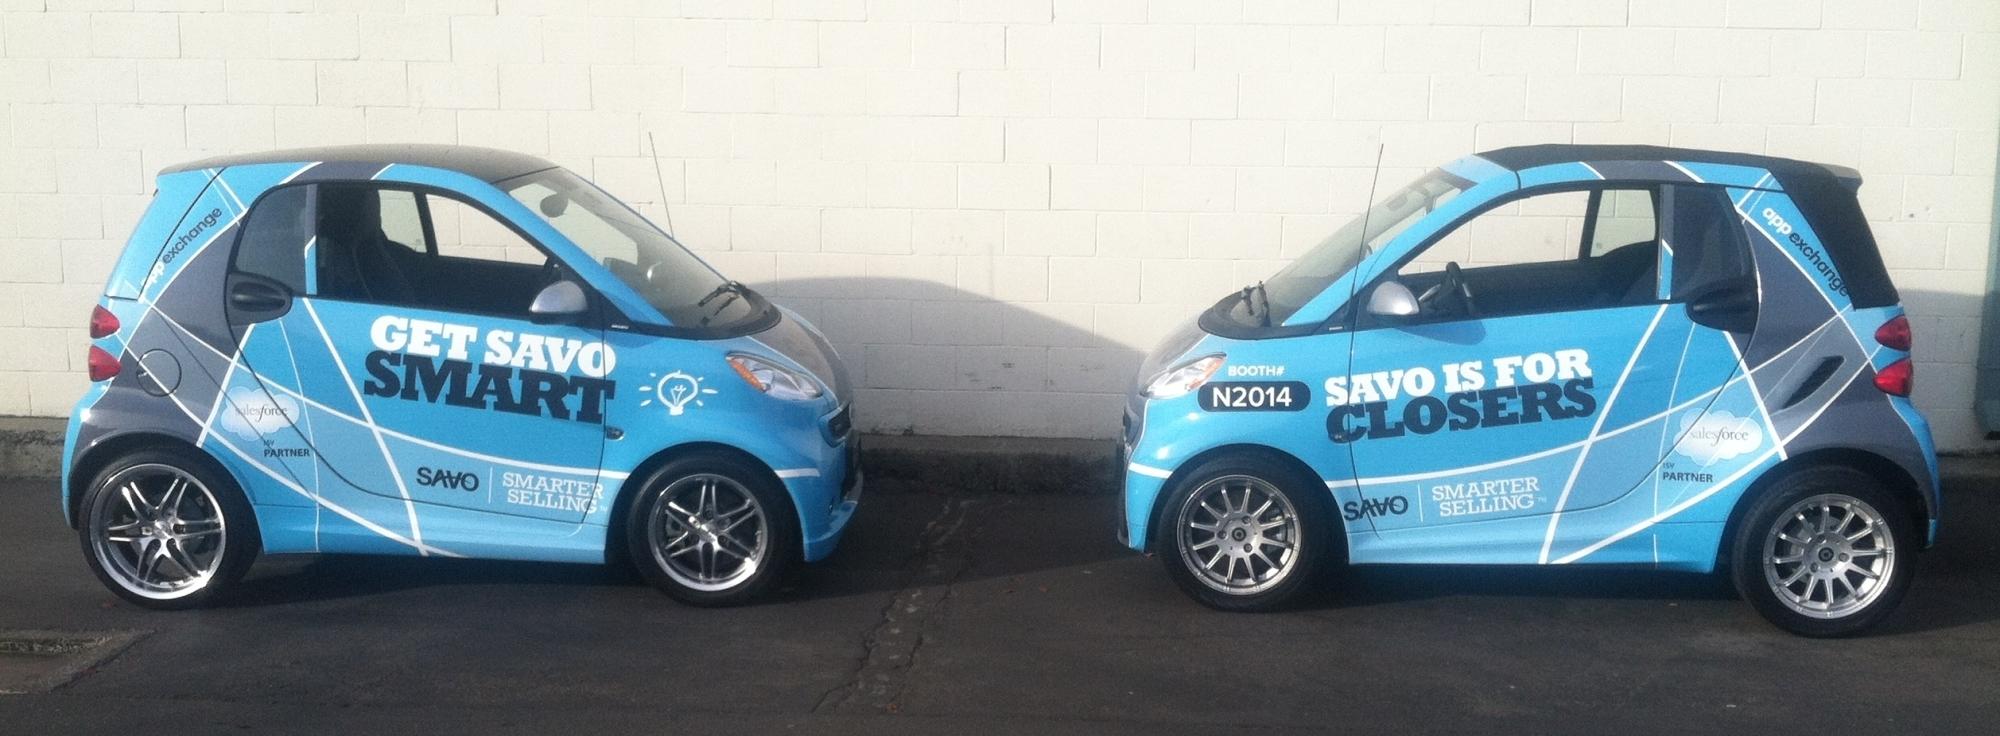 Smart Car Wrap Template Sponsorship Letters Examples Free Lesson Savo Smart  Car Wrap 07 Smart Car